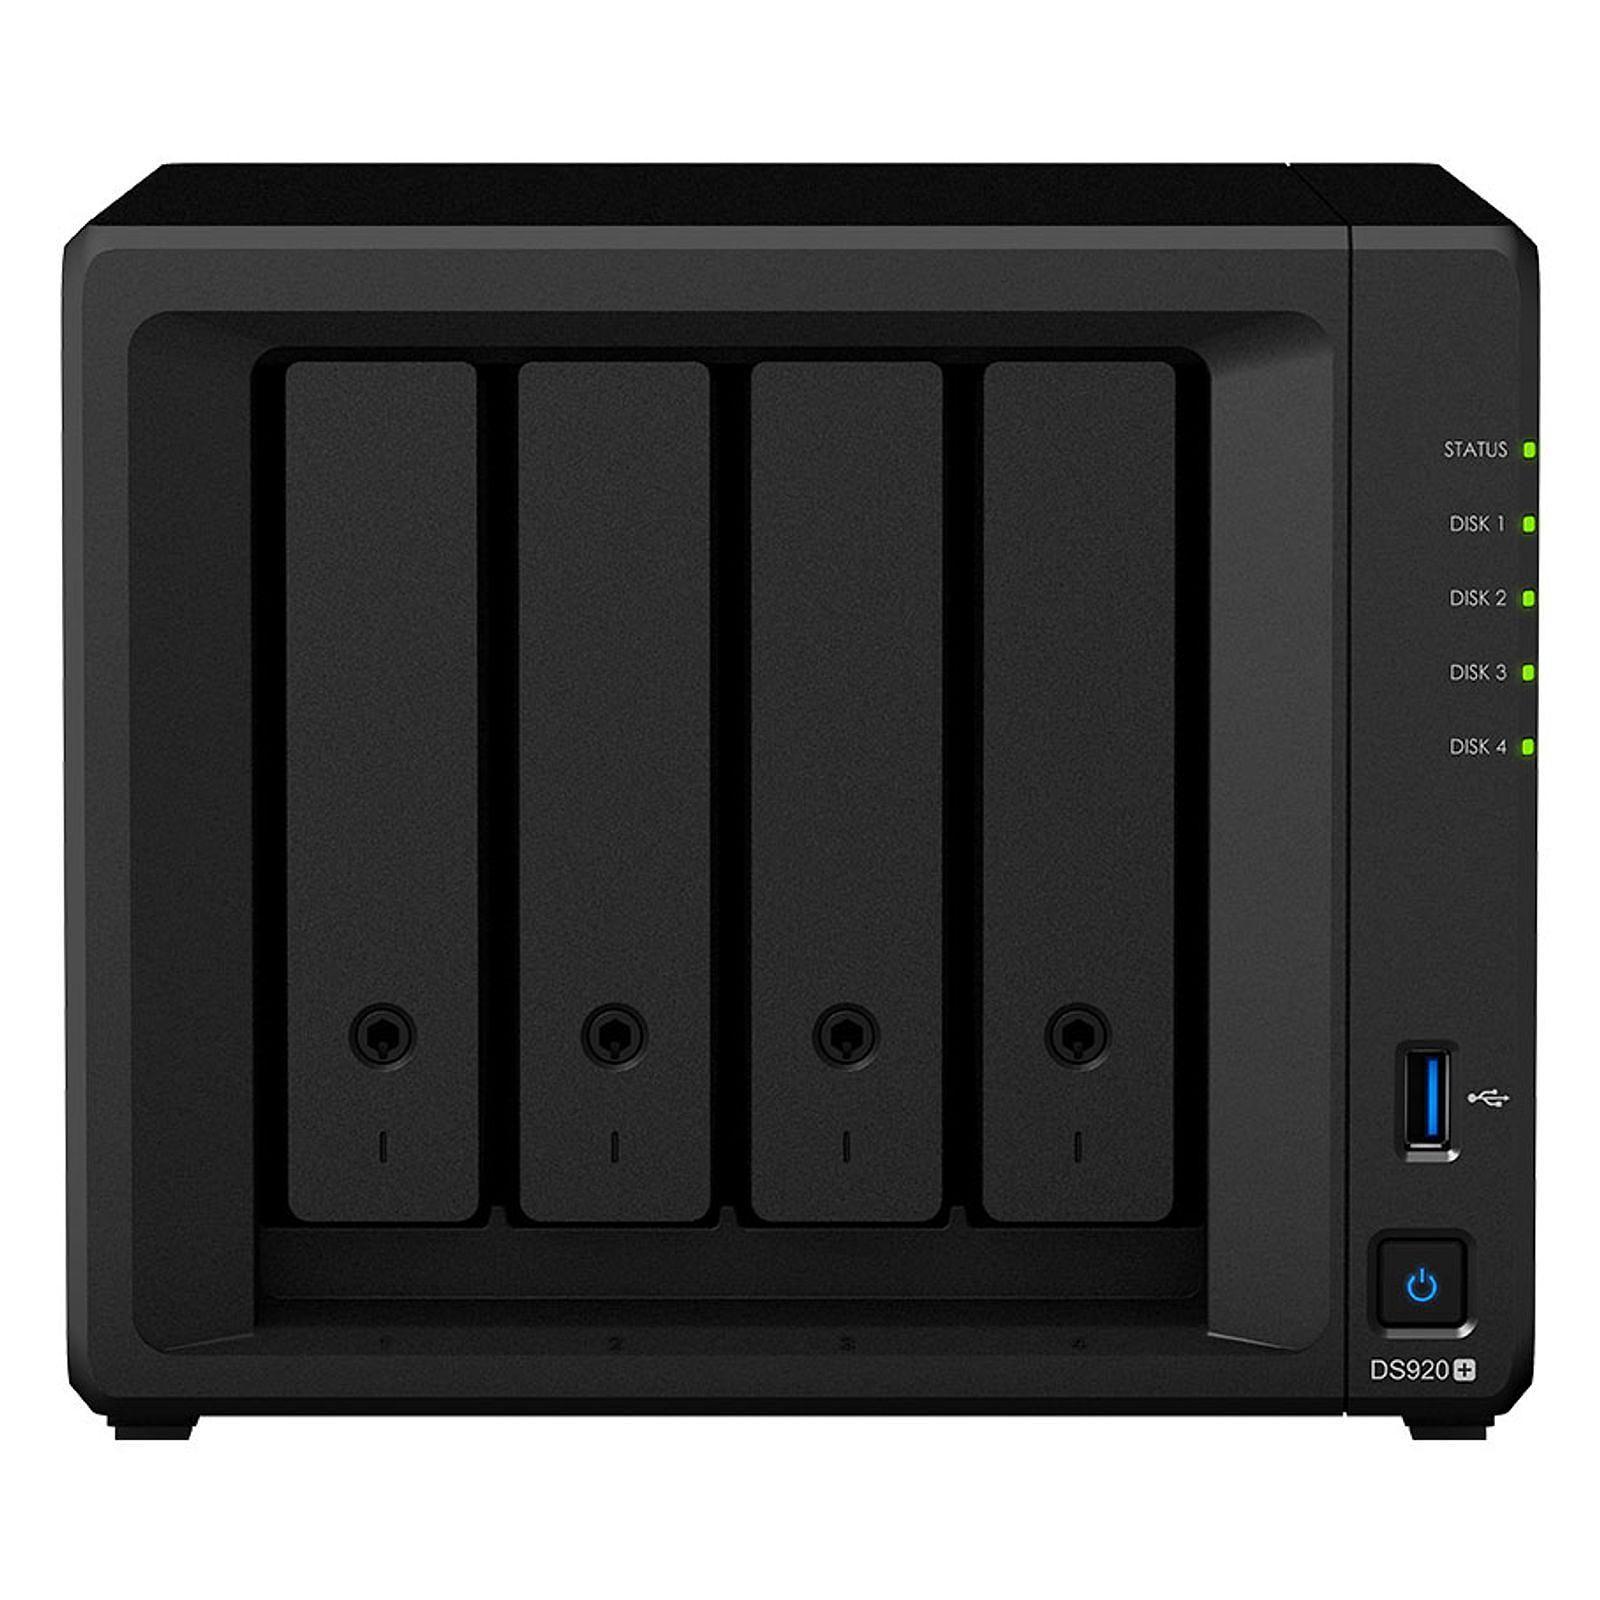 Synology DS920+ - 4 HDD - Serveur NAS Synology - Cybertek.fr - 0